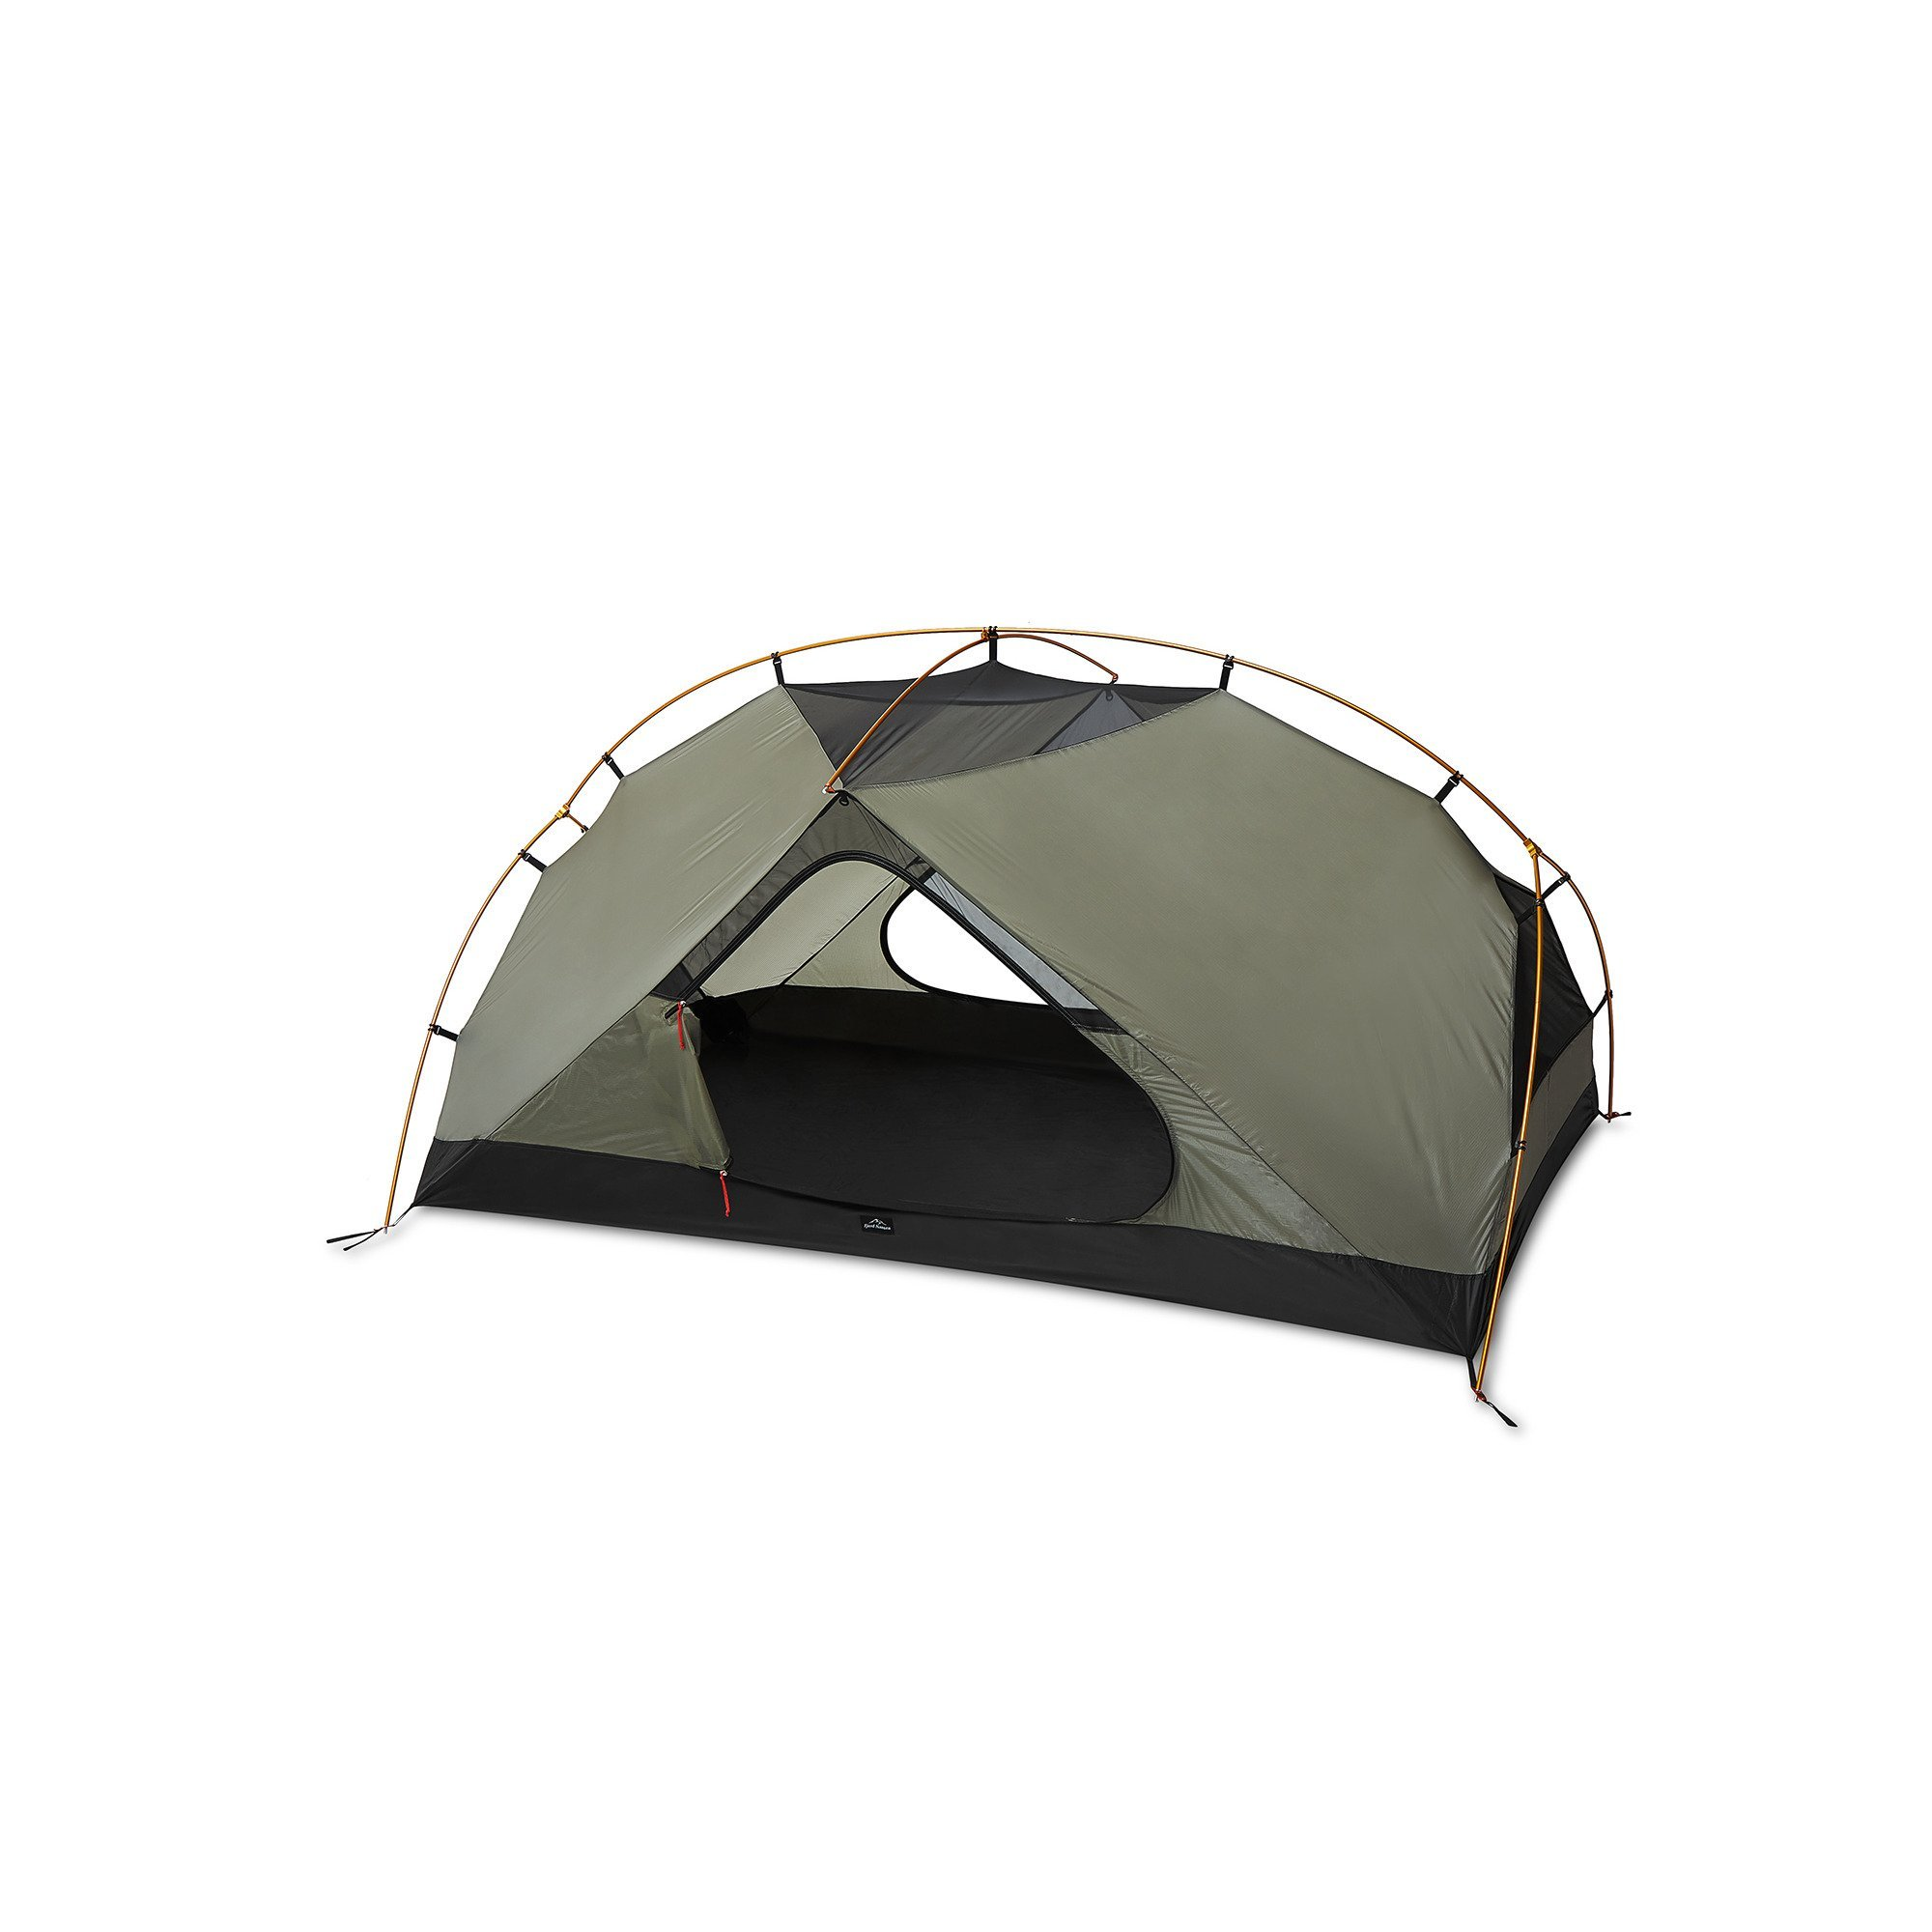 Namiot TROMVIK II NG 2 kg   podróże i trekking namioty